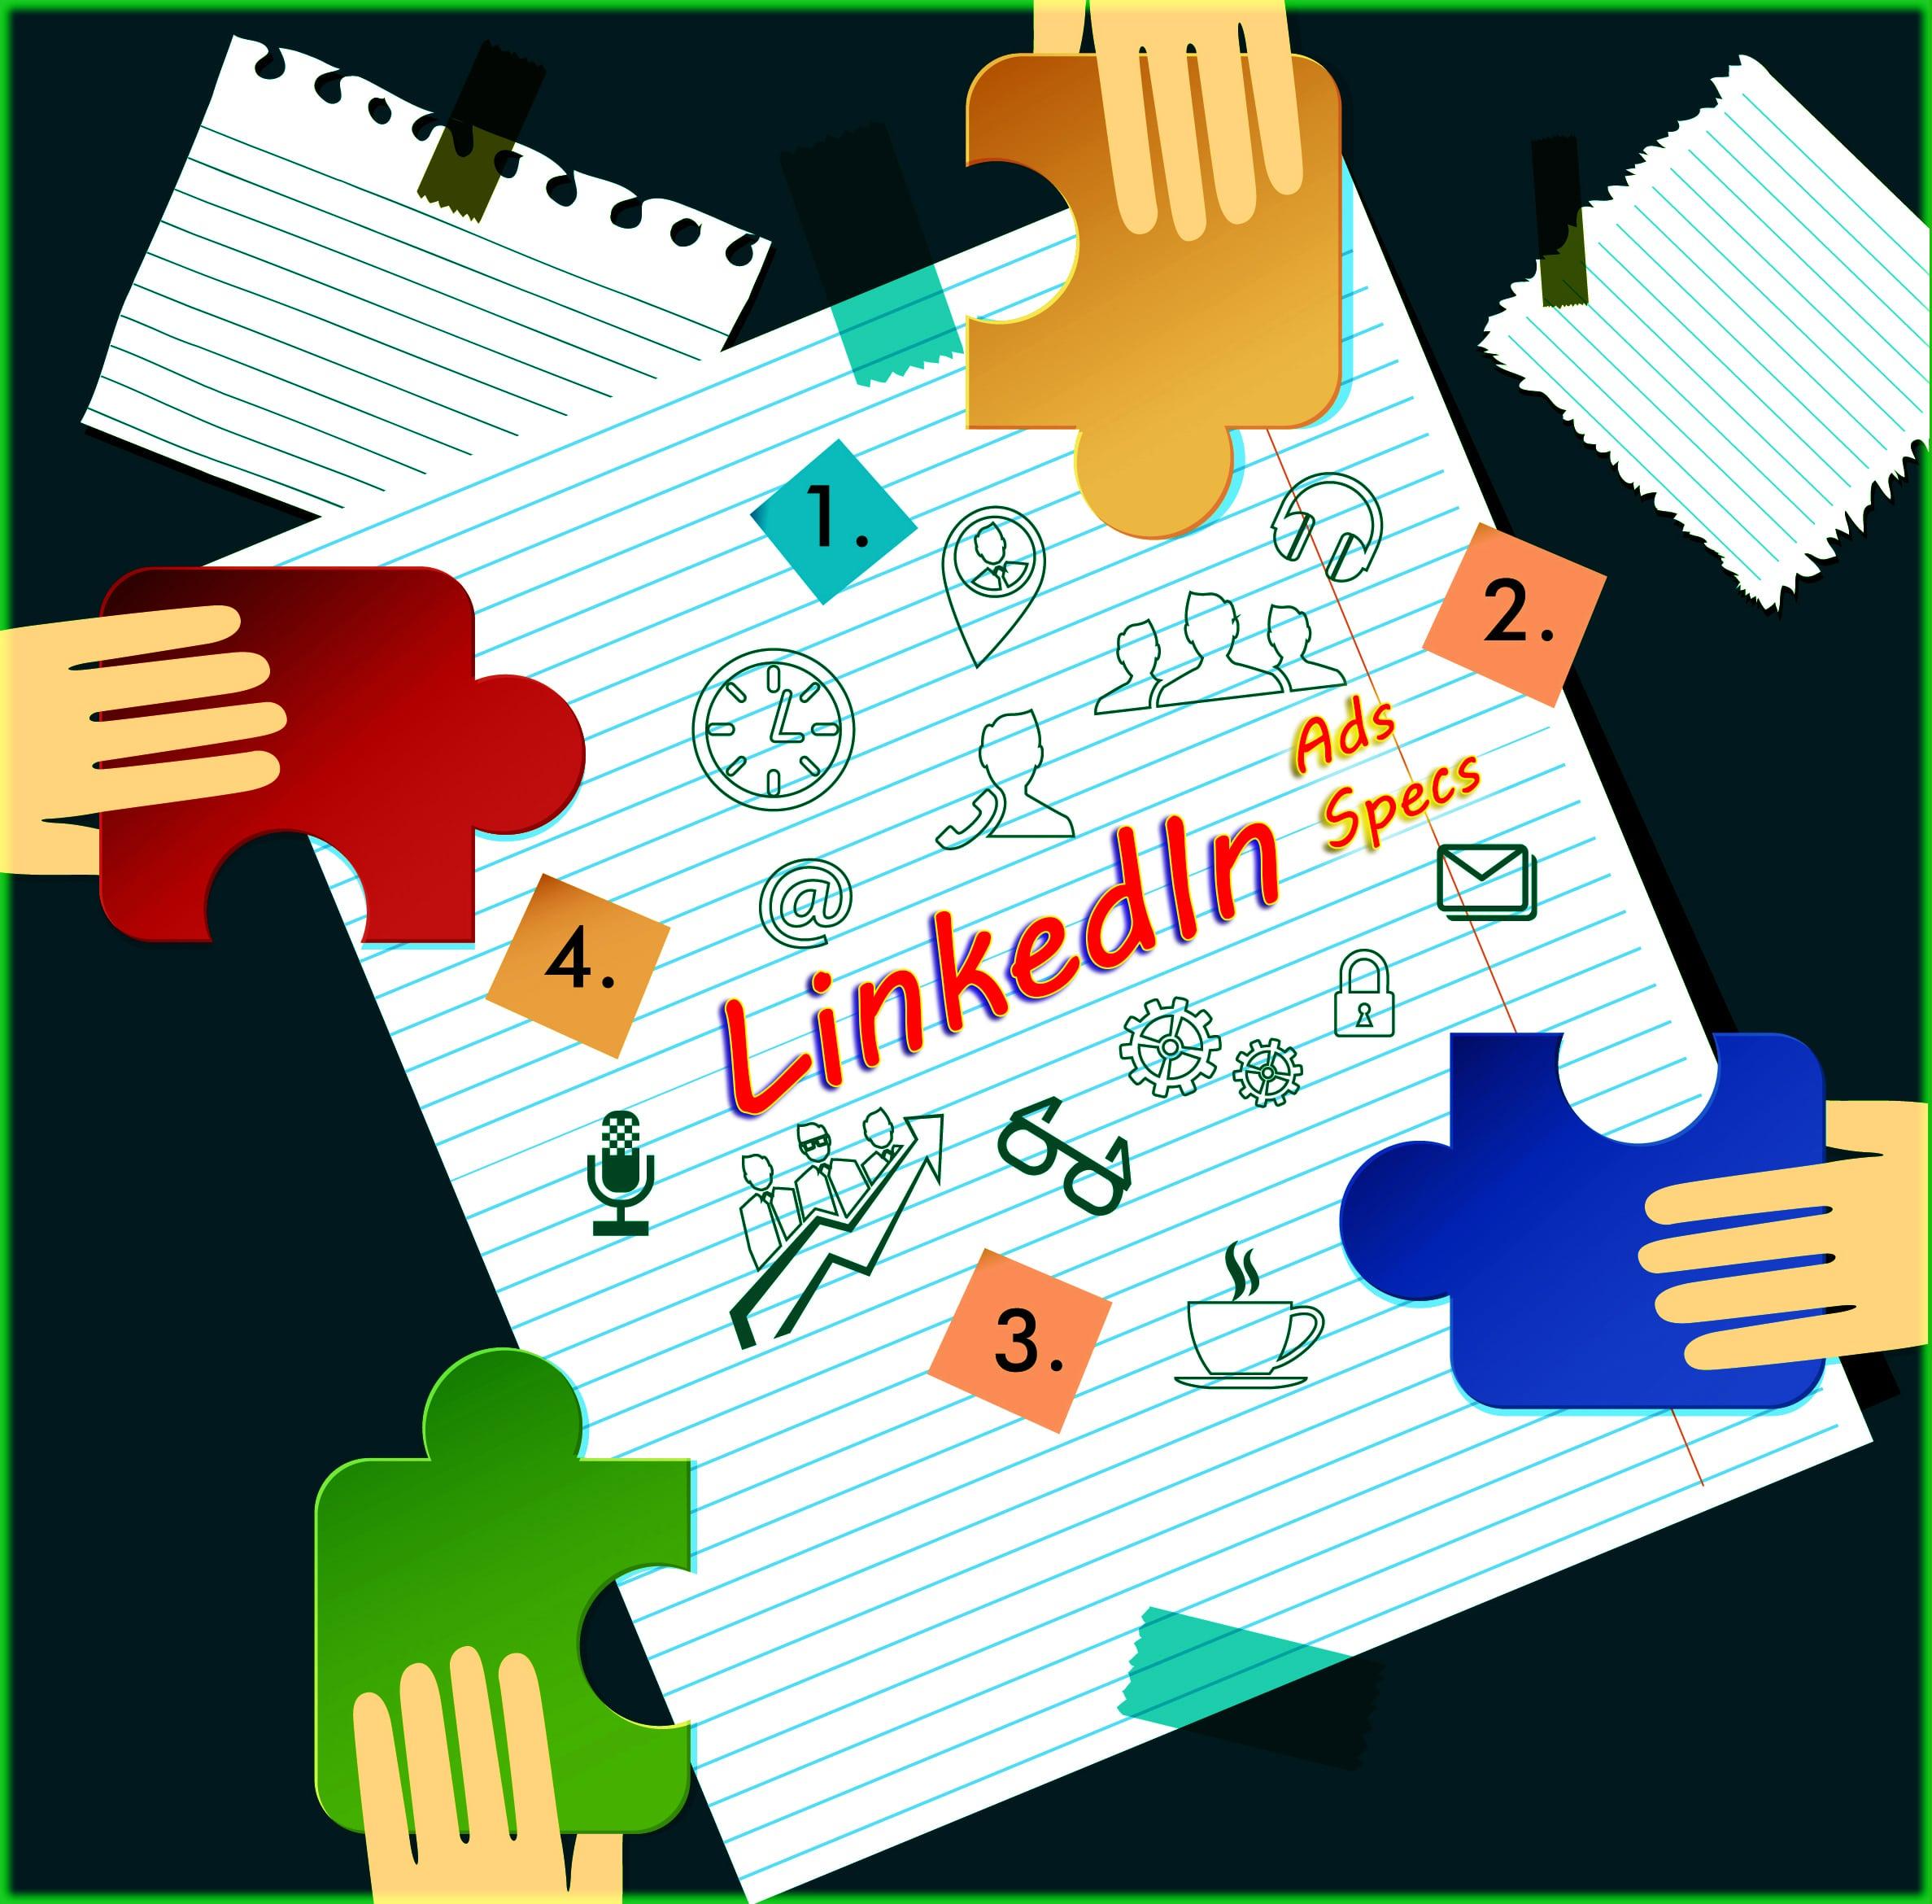 LinkedIn Ads Specs Infographic